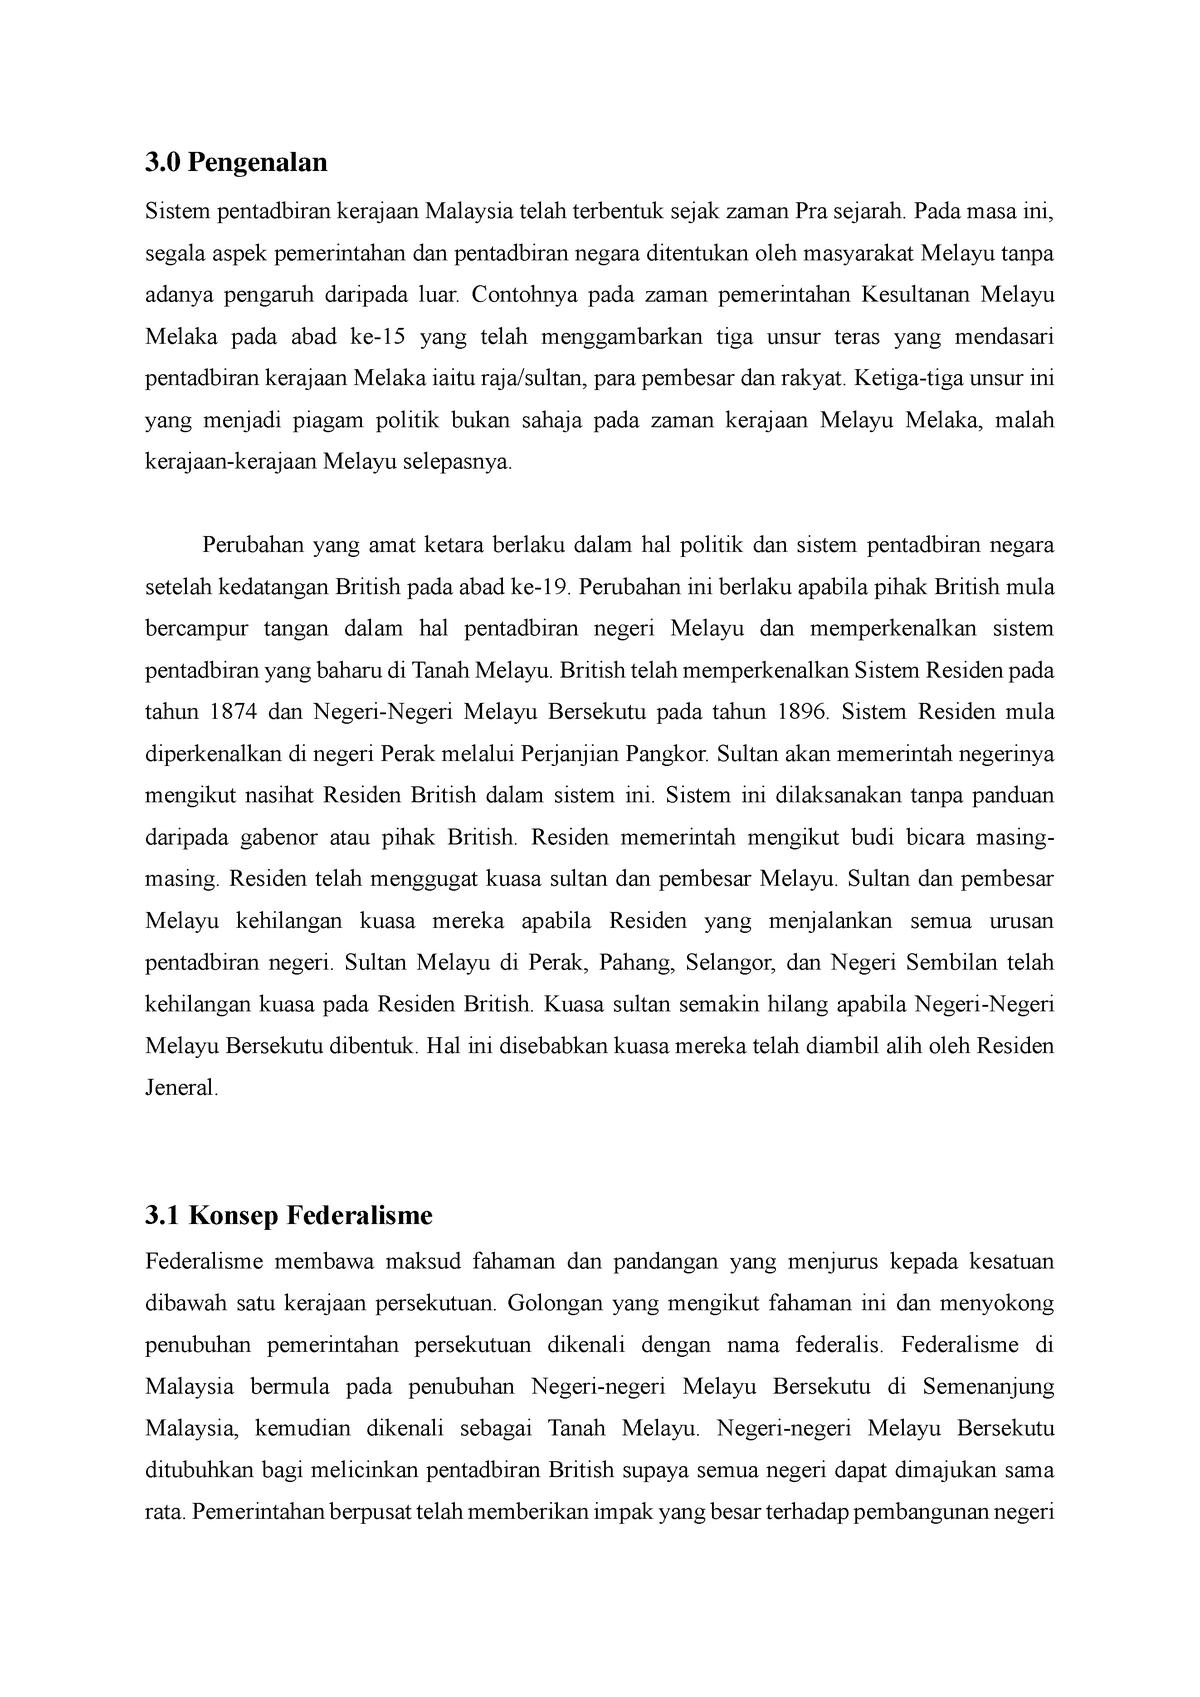 Laporan Bertulis Pengajian Malaysia Bab 3 Warning Tt Undefined Function 32 Studocu